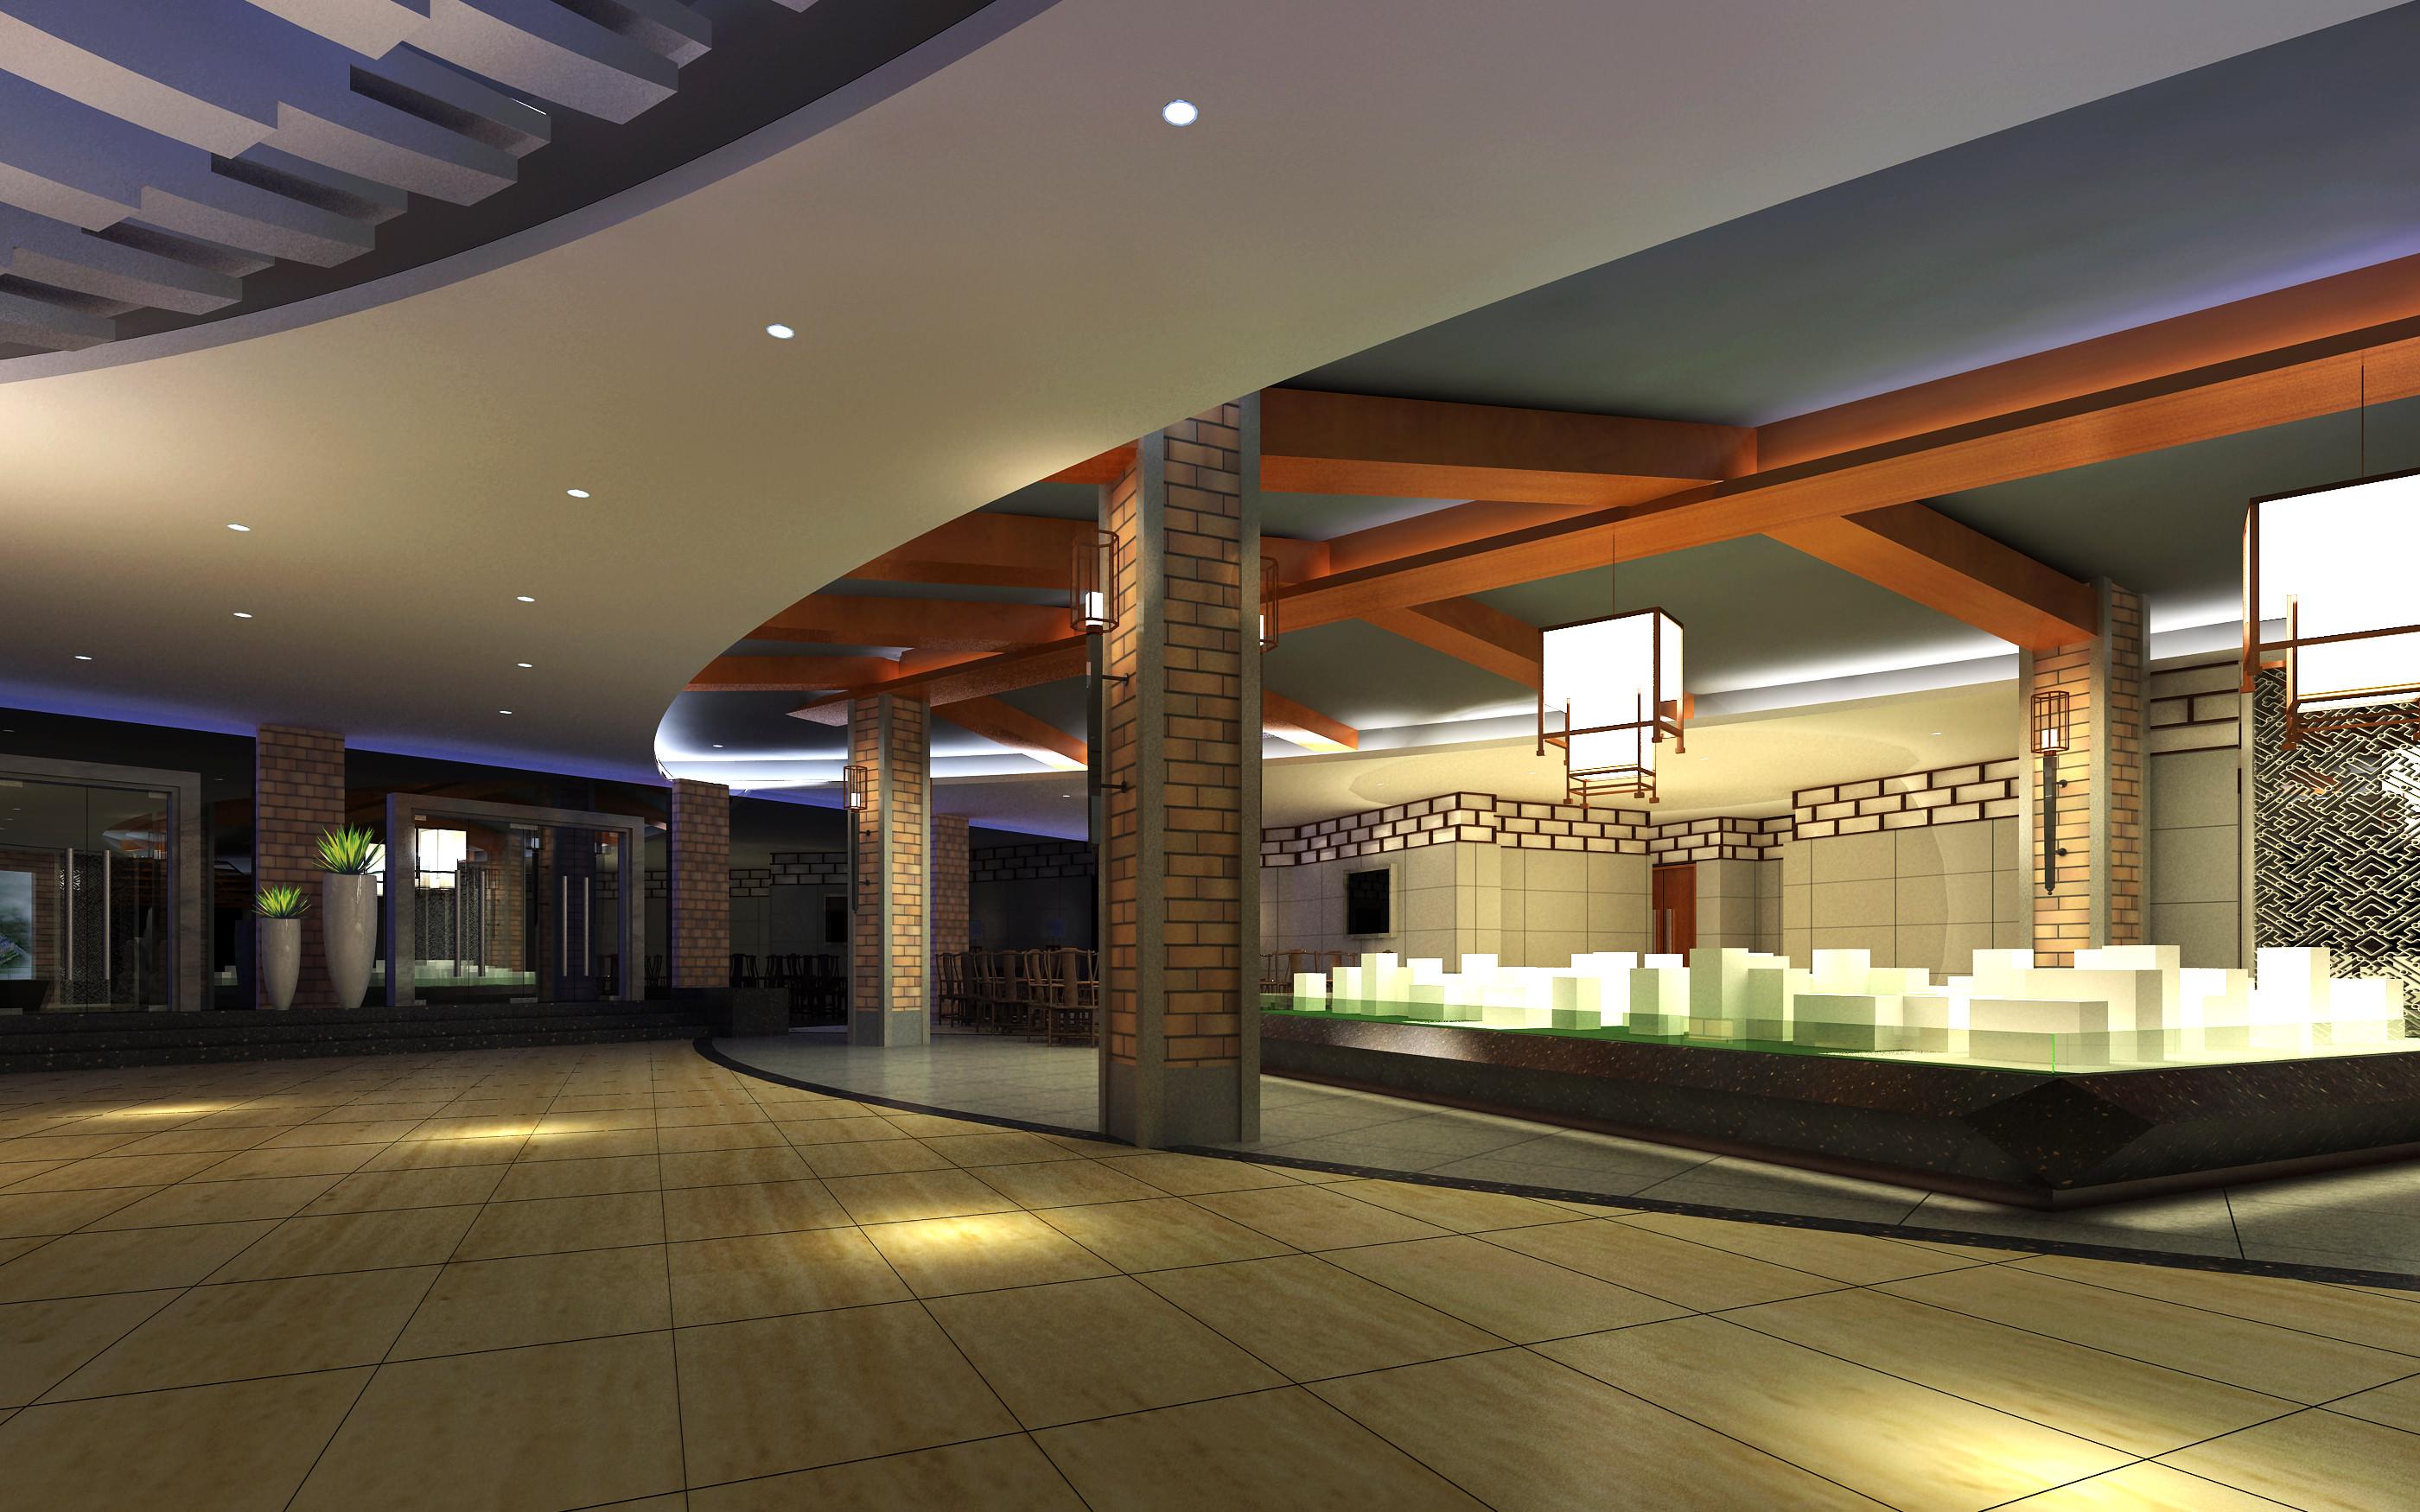 Lobby With Designer Pillar And Interior 3d Model Max 1